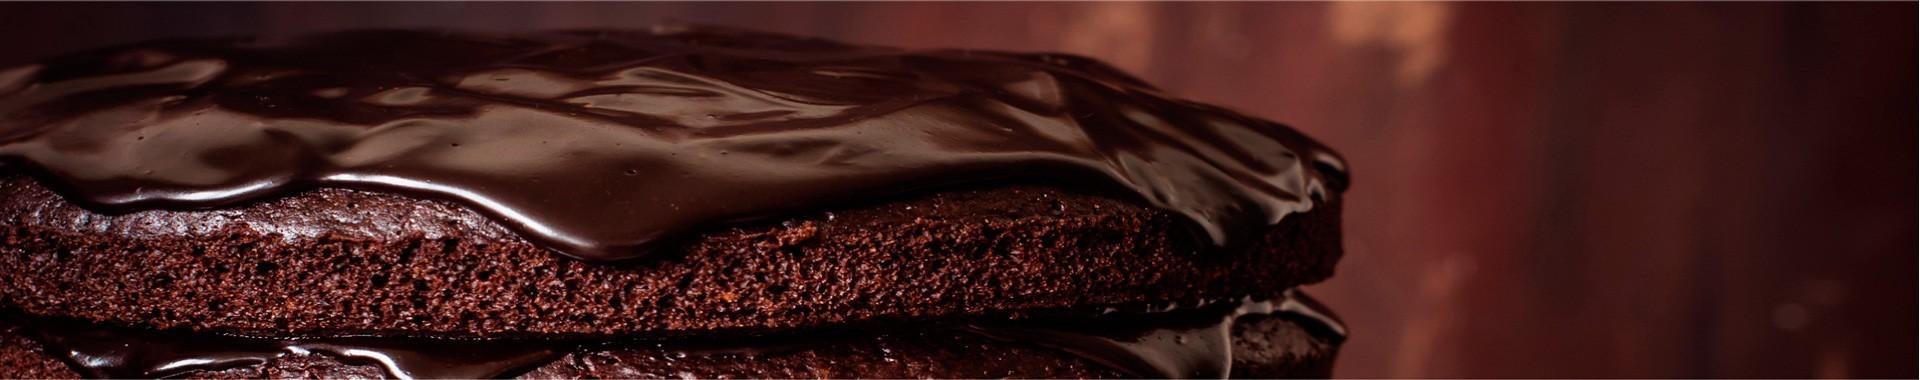 Mousse caliente de chocolate negro